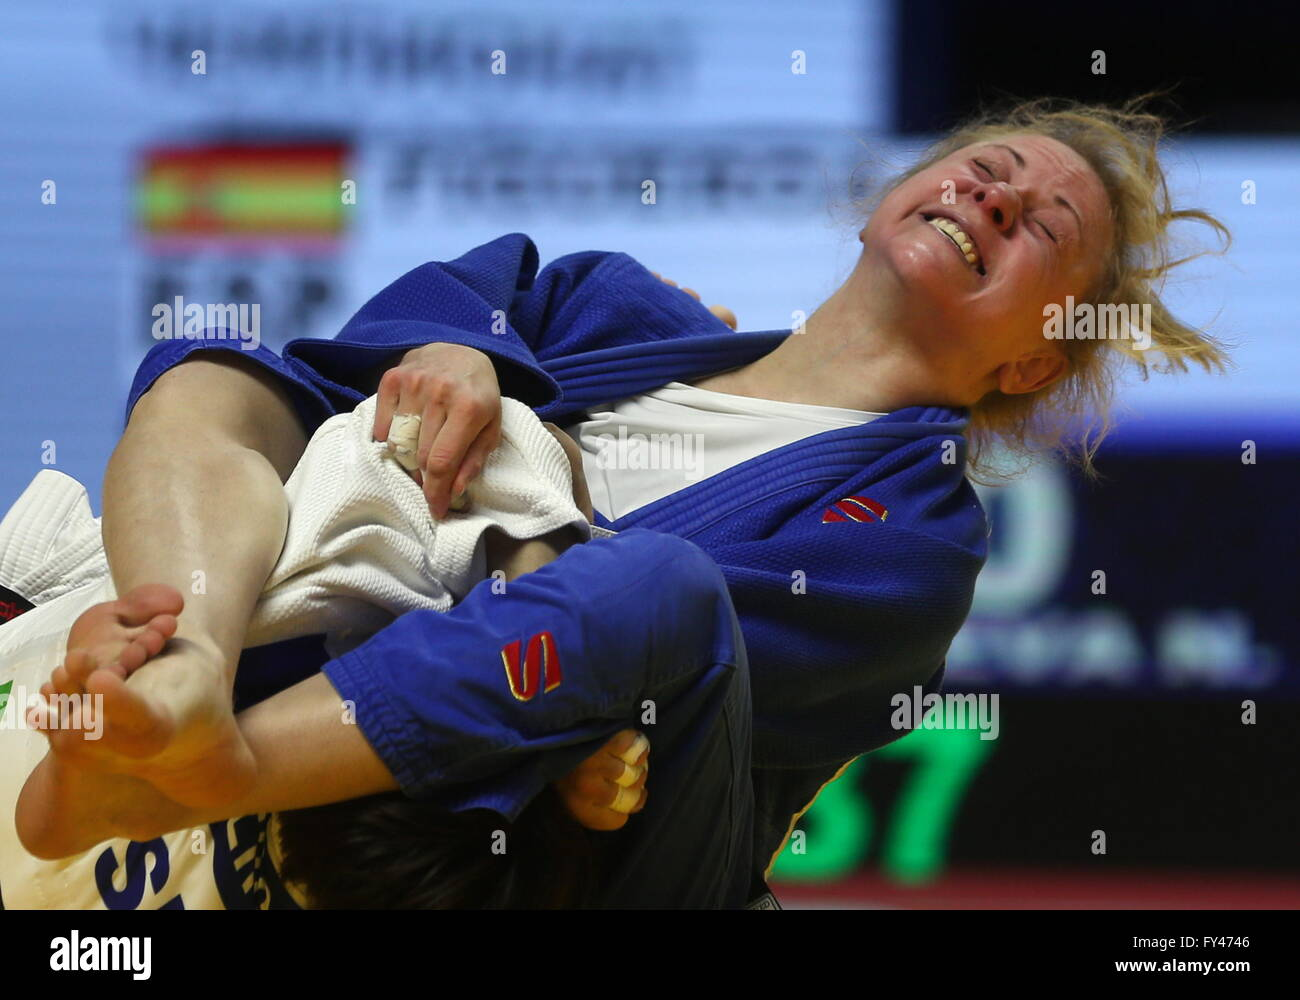 Kazan, Russia. 21st Apr, 2016. Russian judoka Nataliya Kondratyeva competes in the women's -48kg event at the - Stock Image